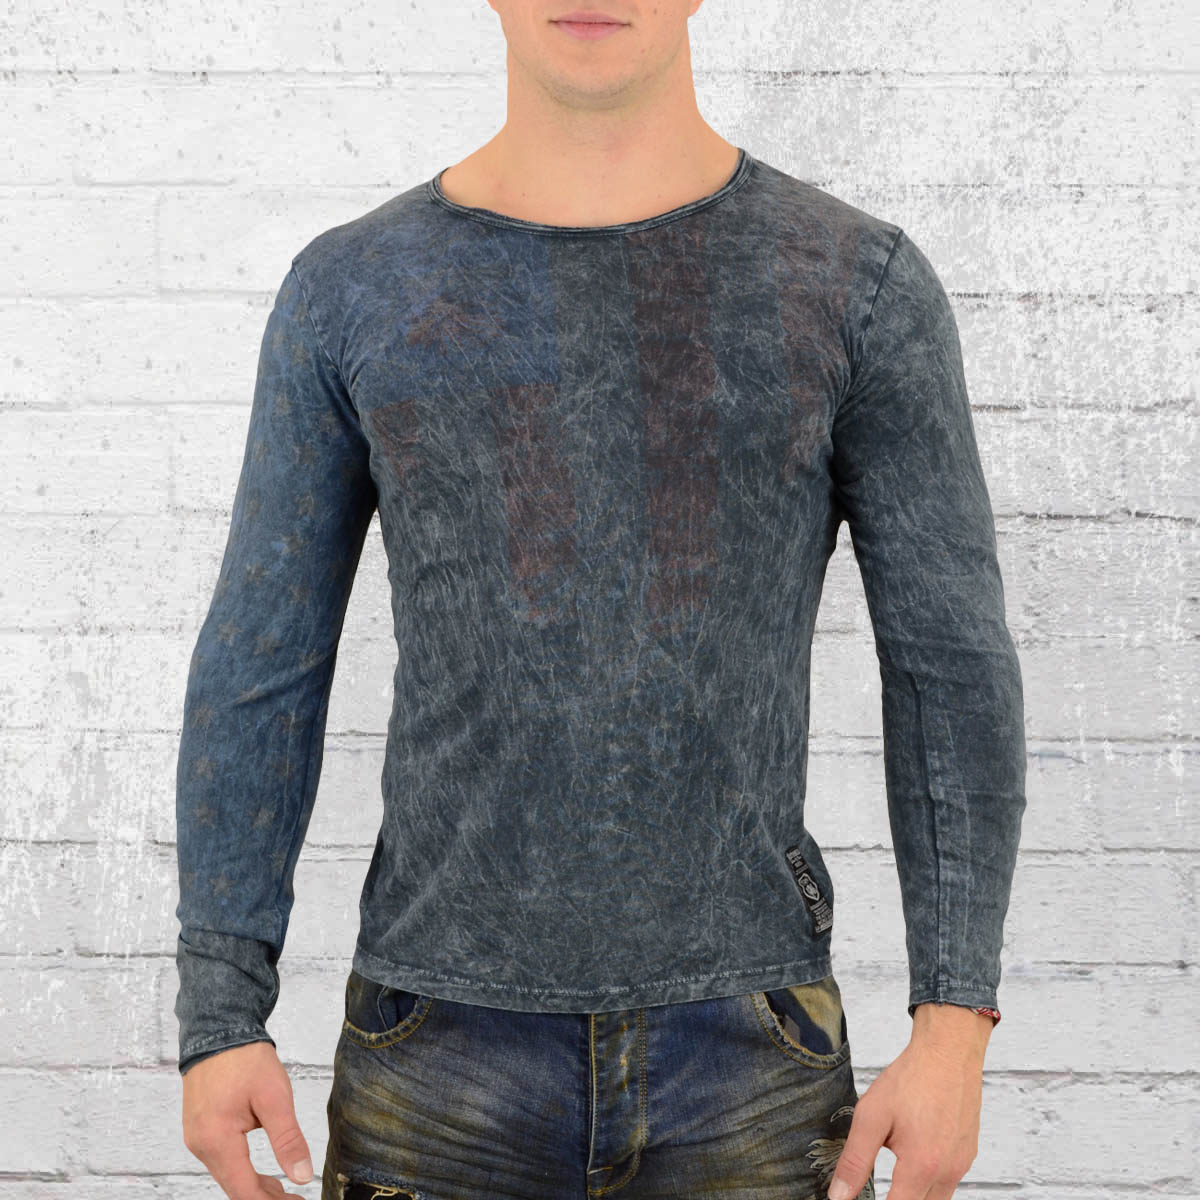 c02d6aacad6d Jetzt bestellen   Rusty Neal Stars N Stripes Longsleeve T-Shirt ...